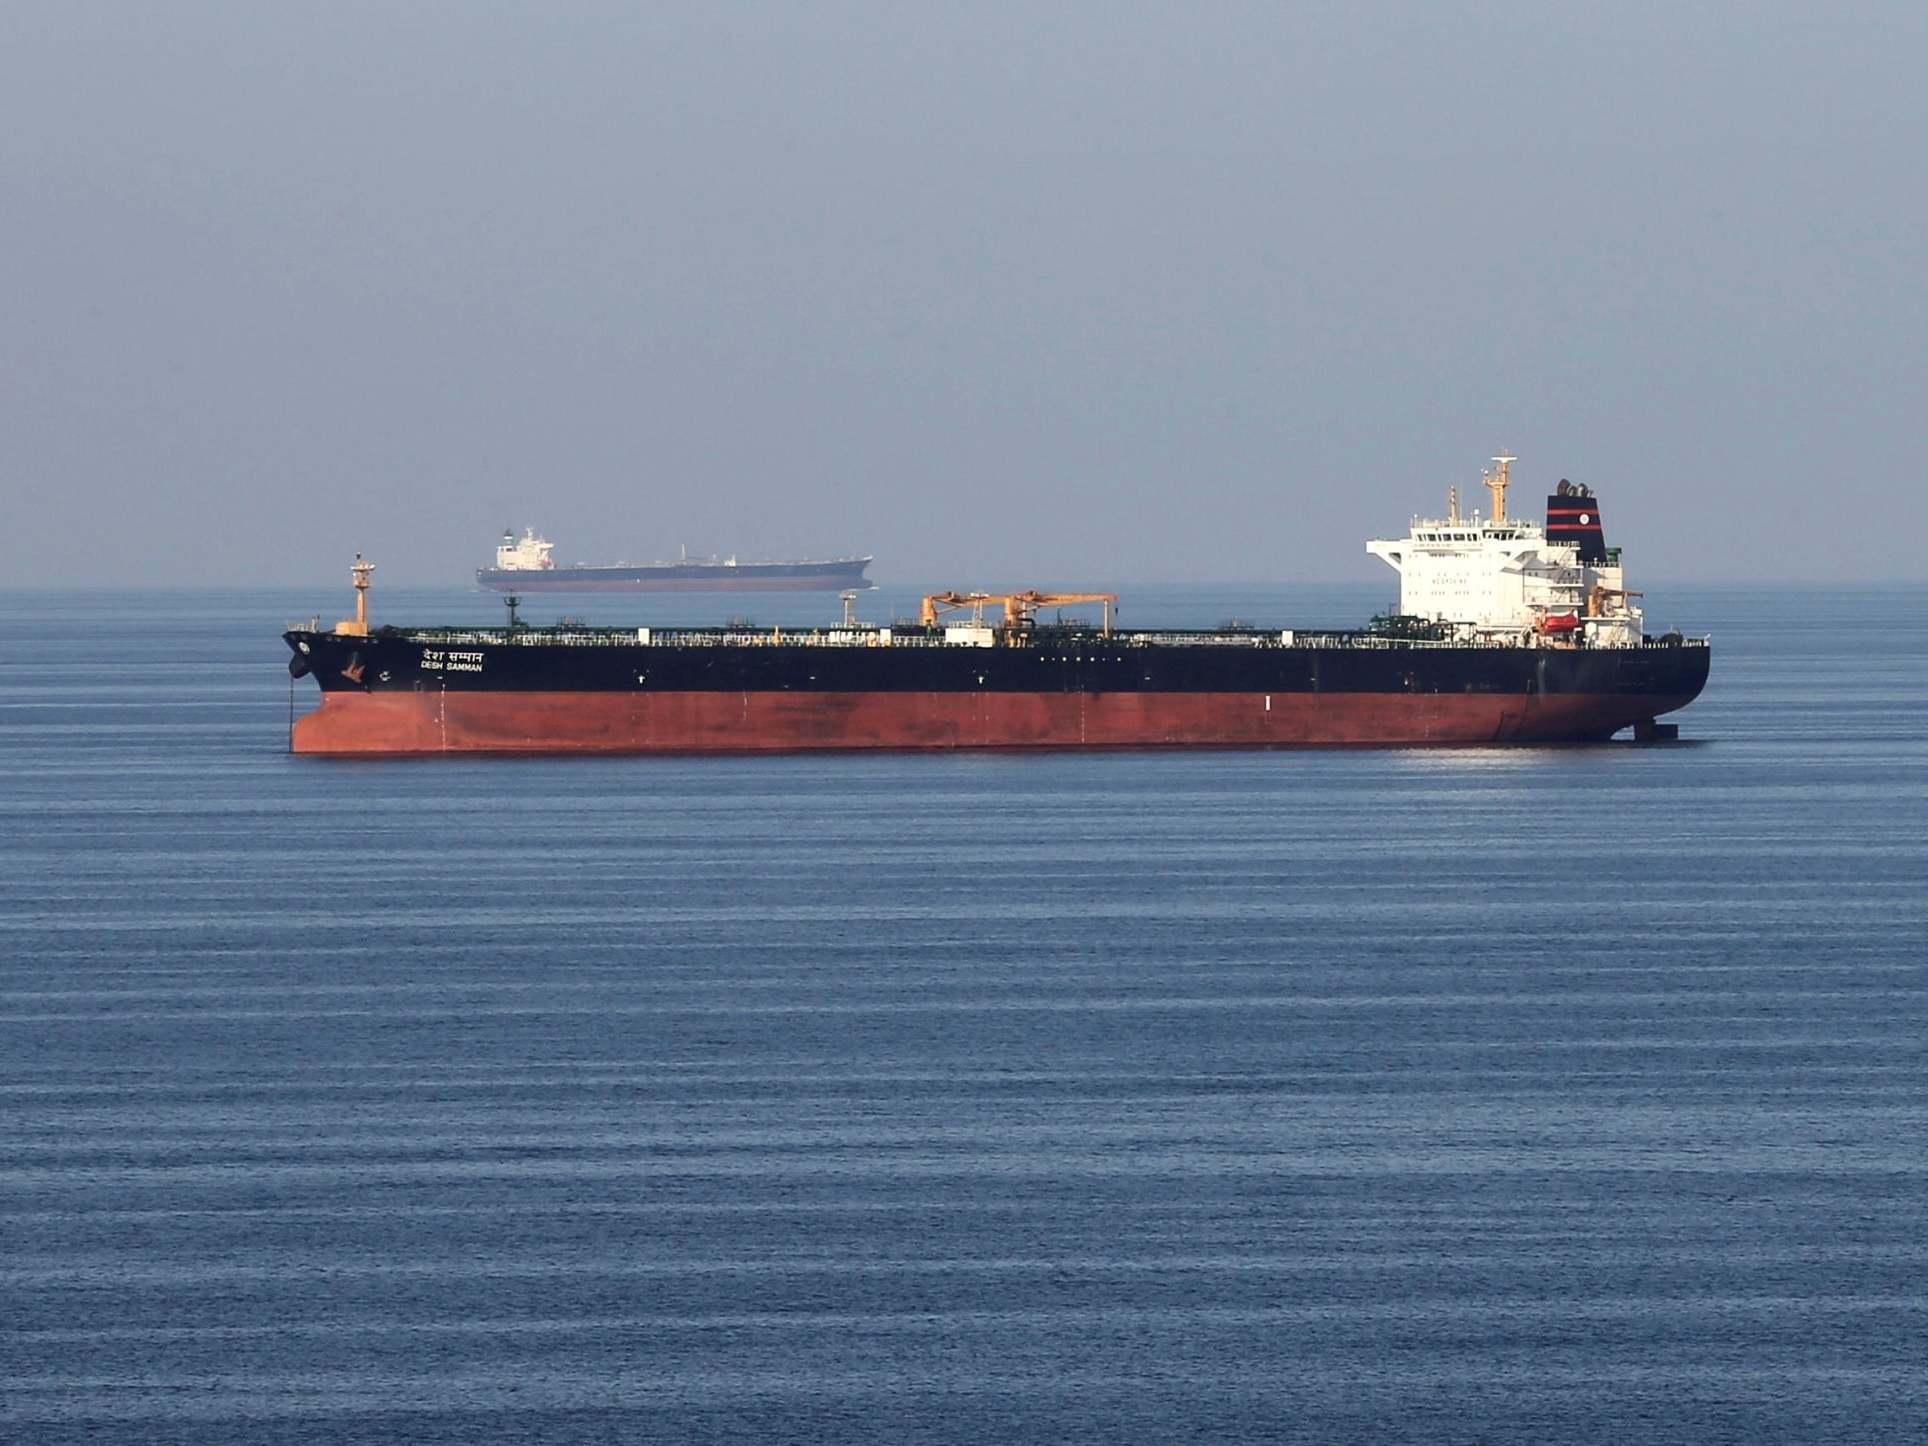 Britain will face 'repercussions' for seizing Iranian oil tanker, pr…